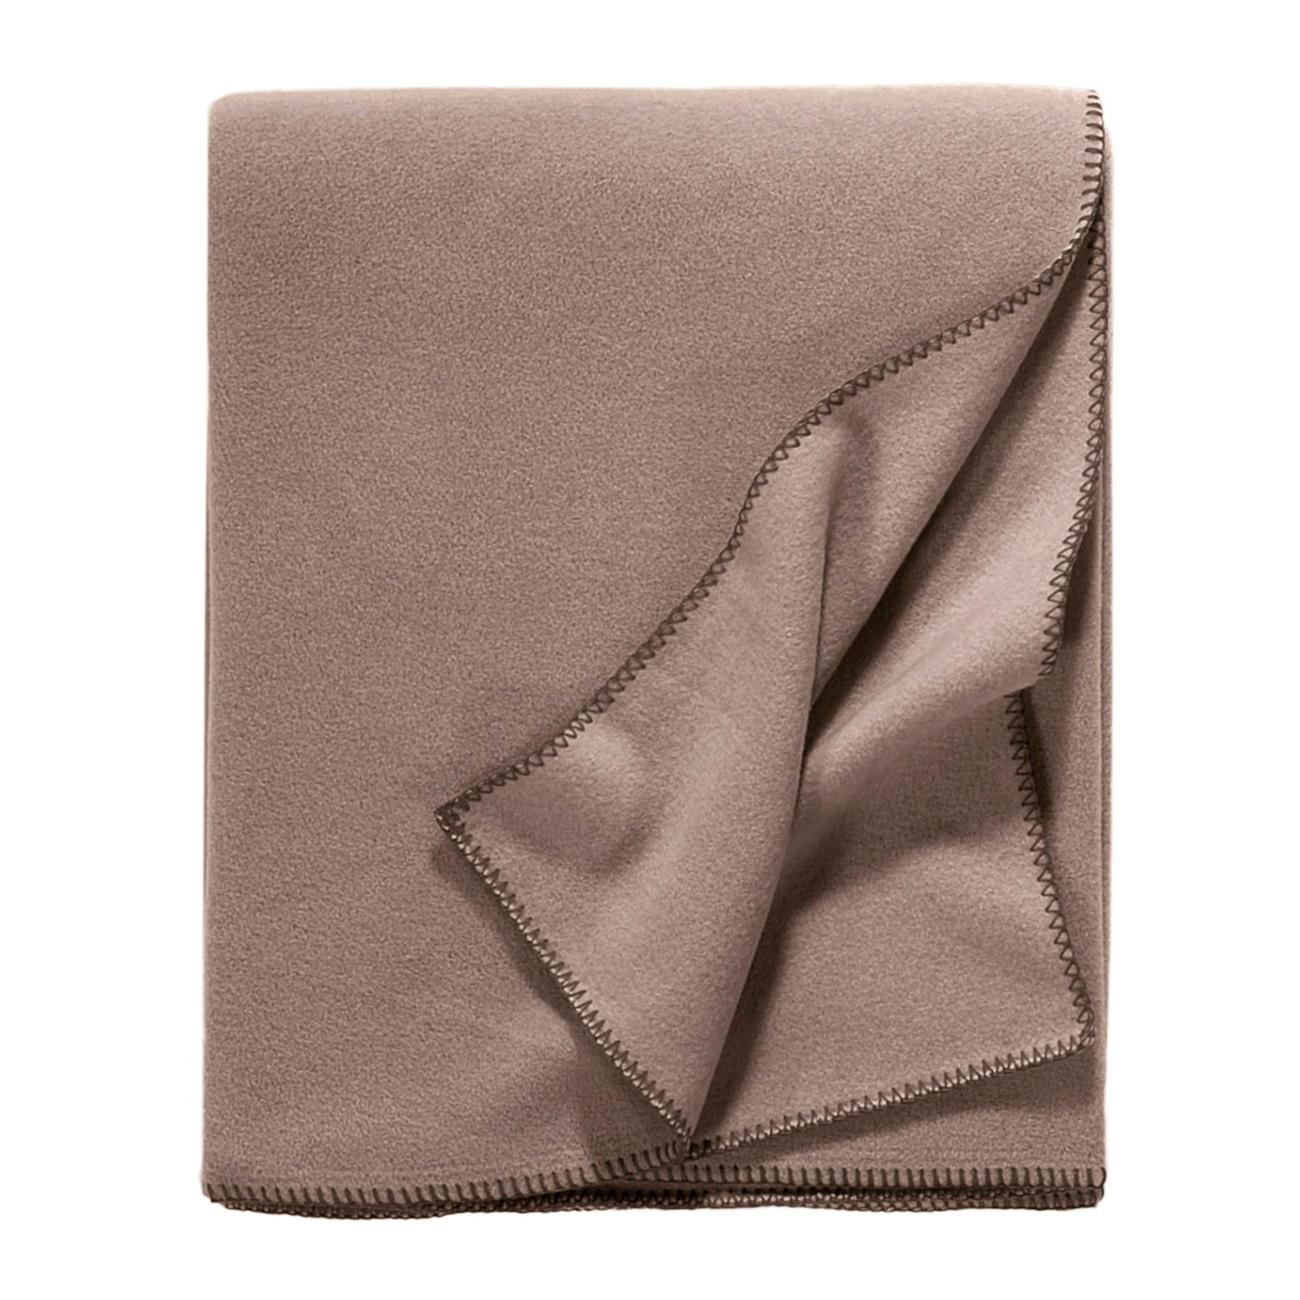 edel fleece decke 3 jahre garantie pro idee. Black Bedroom Furniture Sets. Home Design Ideas